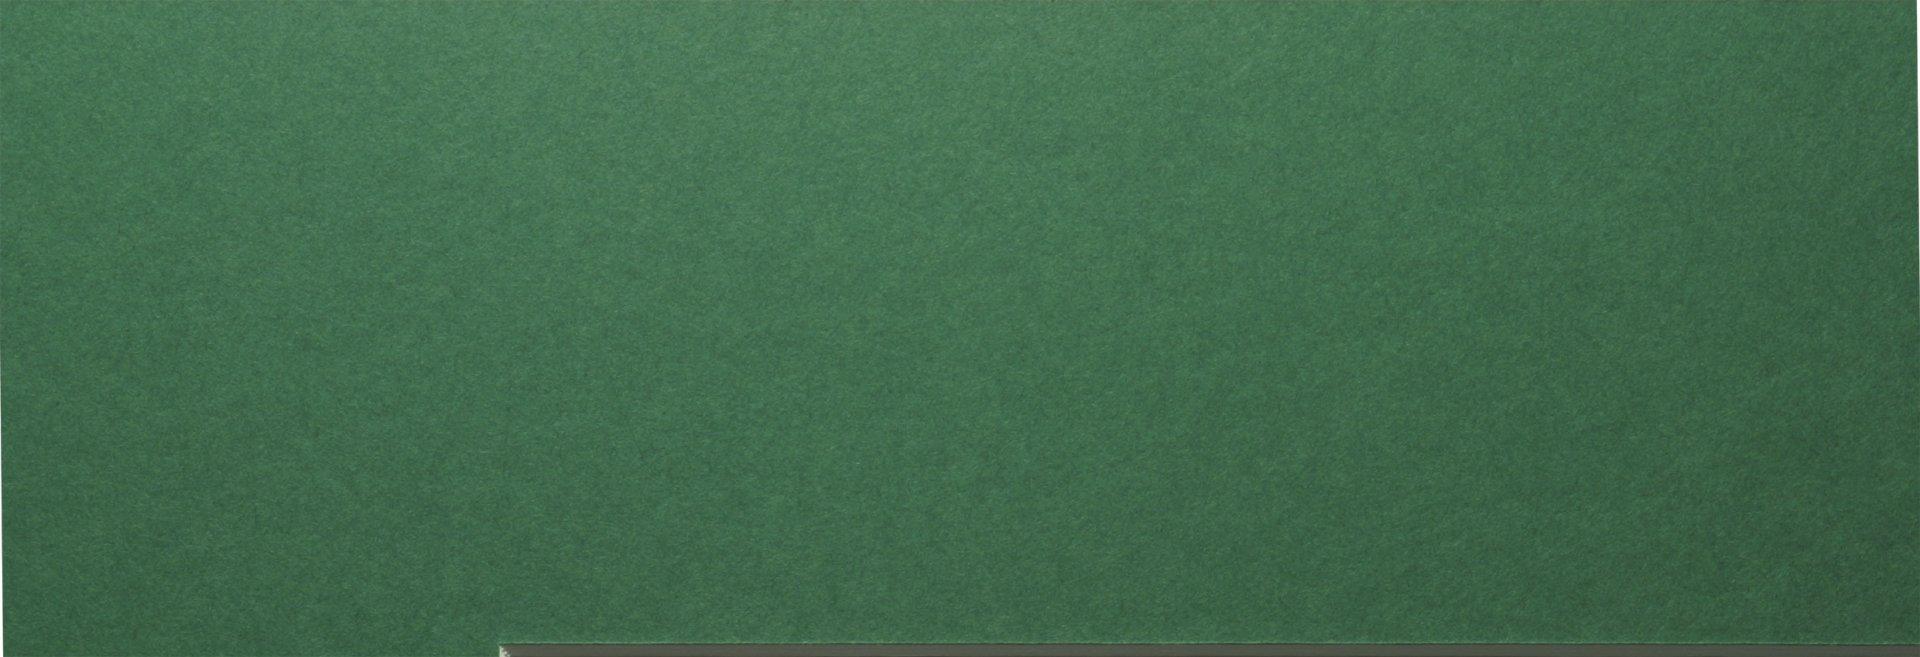 SRM 919 Ivy Green